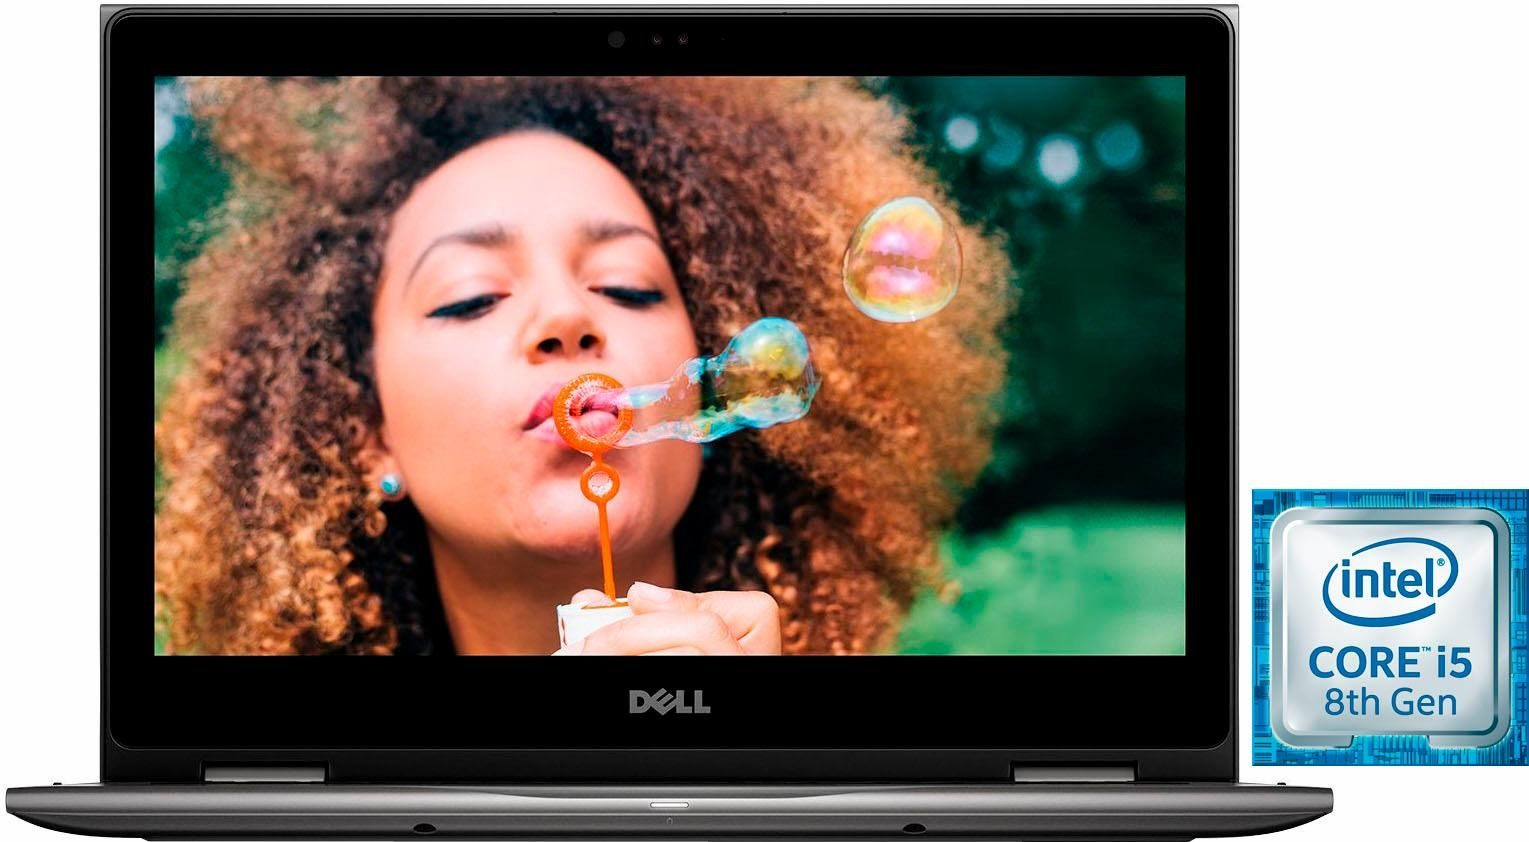 Dell EMC Inspiron 13-5370 Notebook (33,78 cm/13,3 Zoll, Intel Core i5, UHD Graphics, , 256 GB SSD)